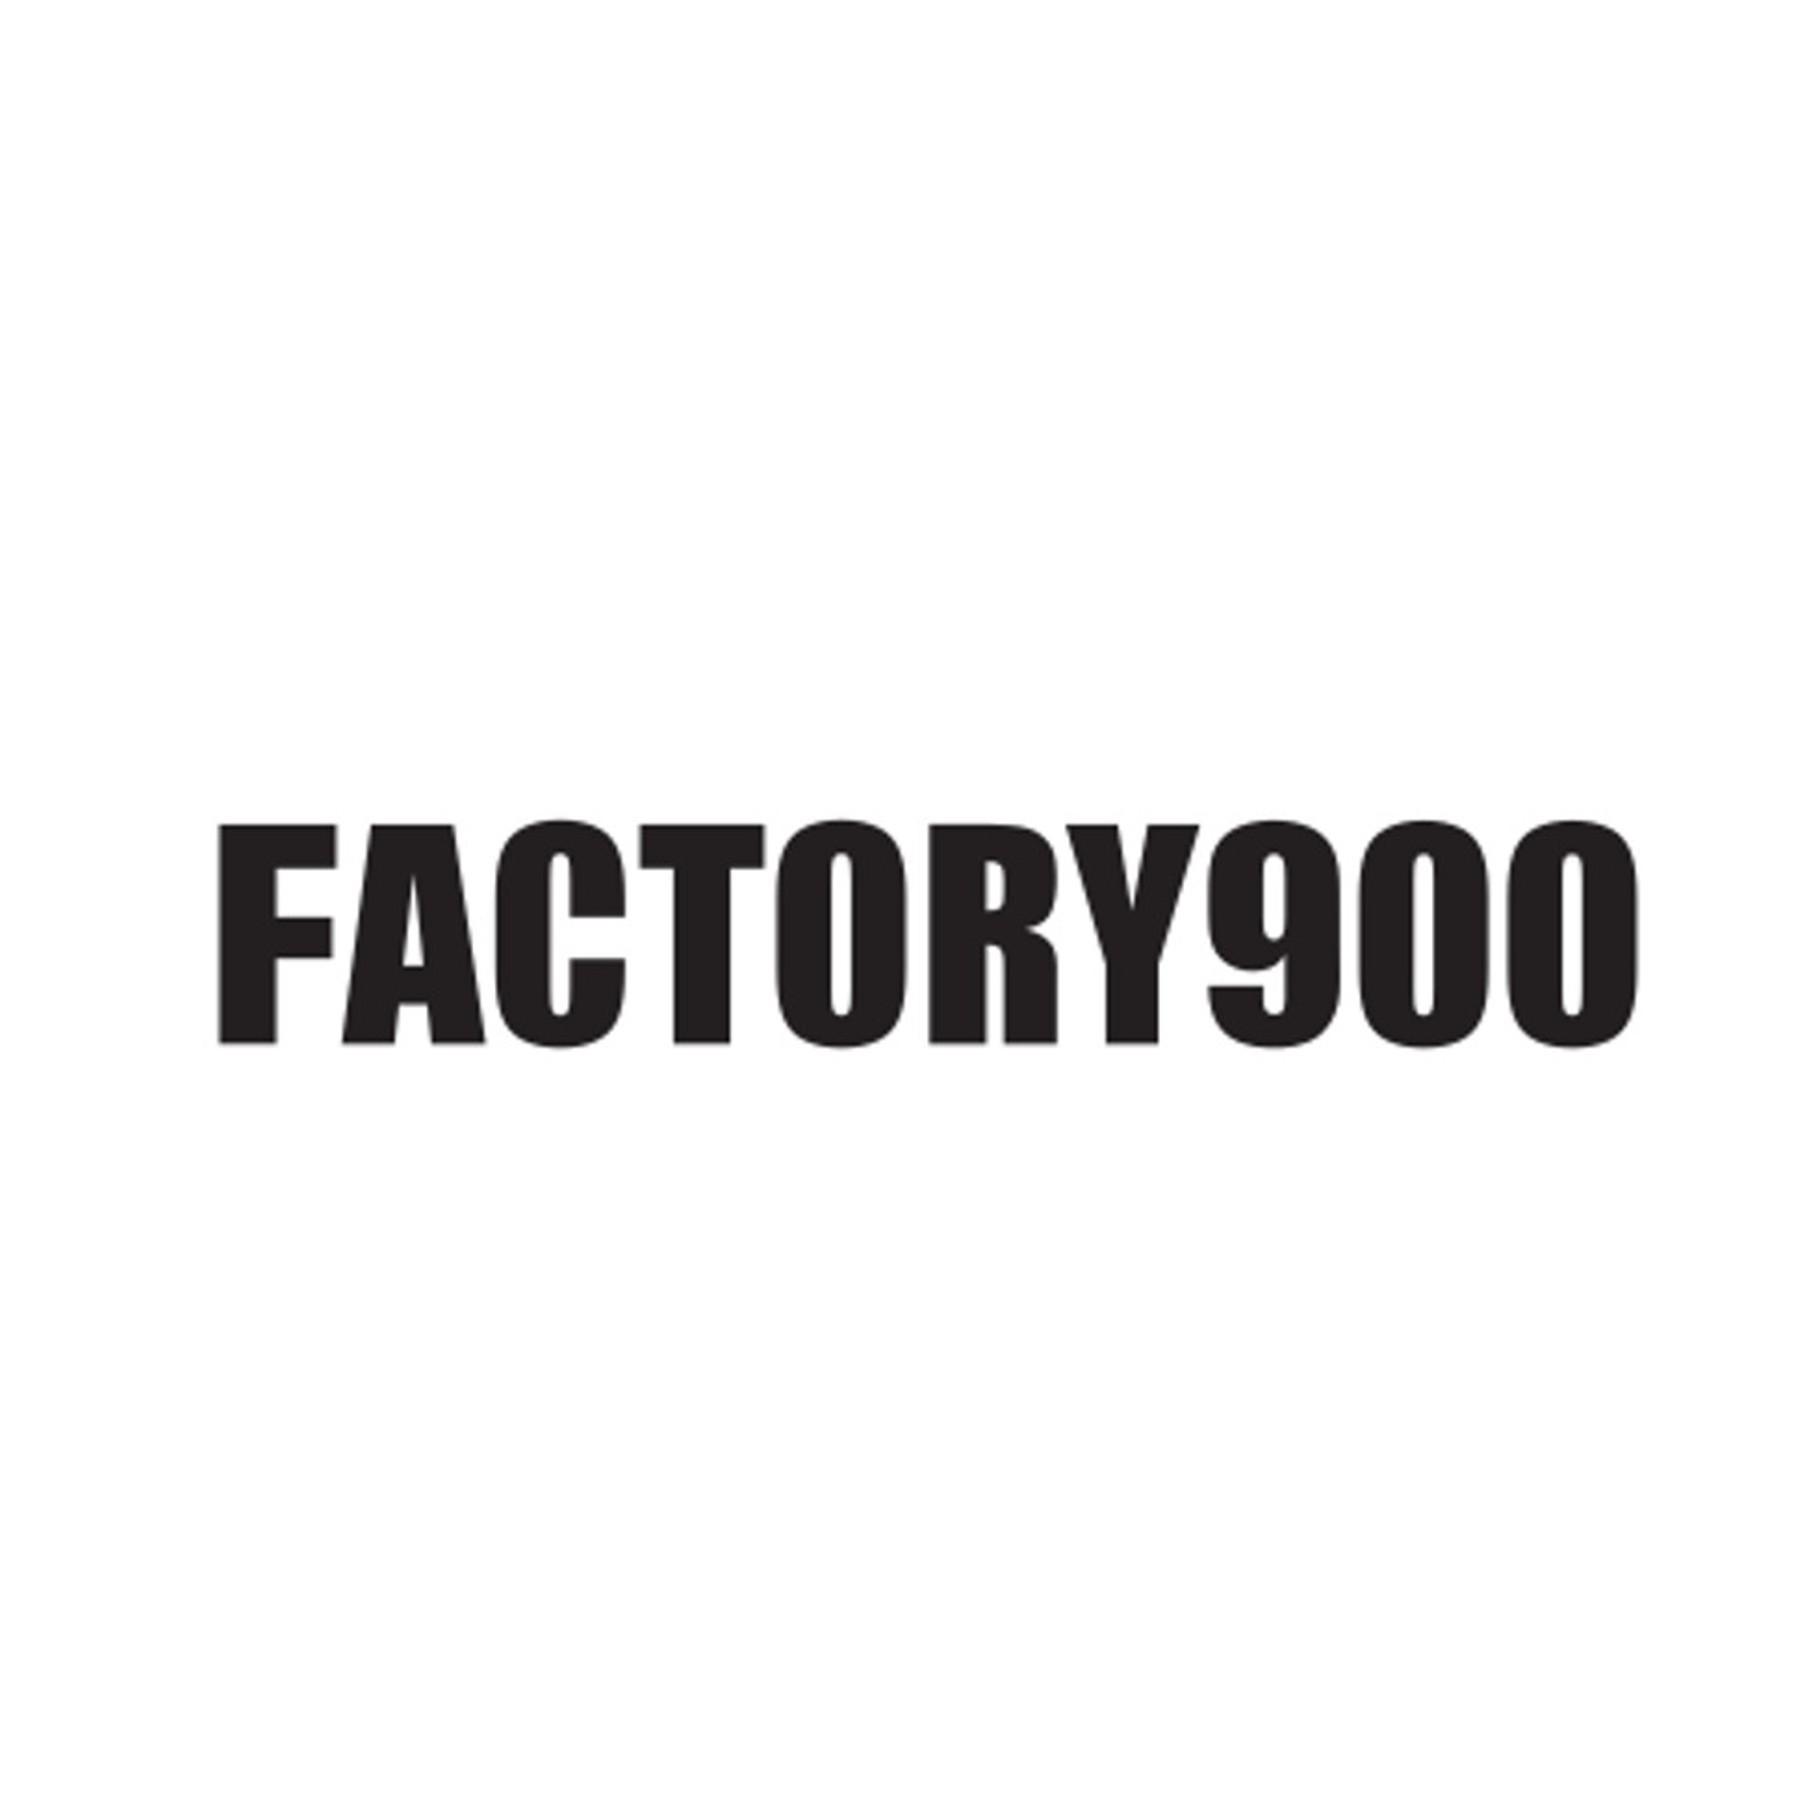 FACTORY900